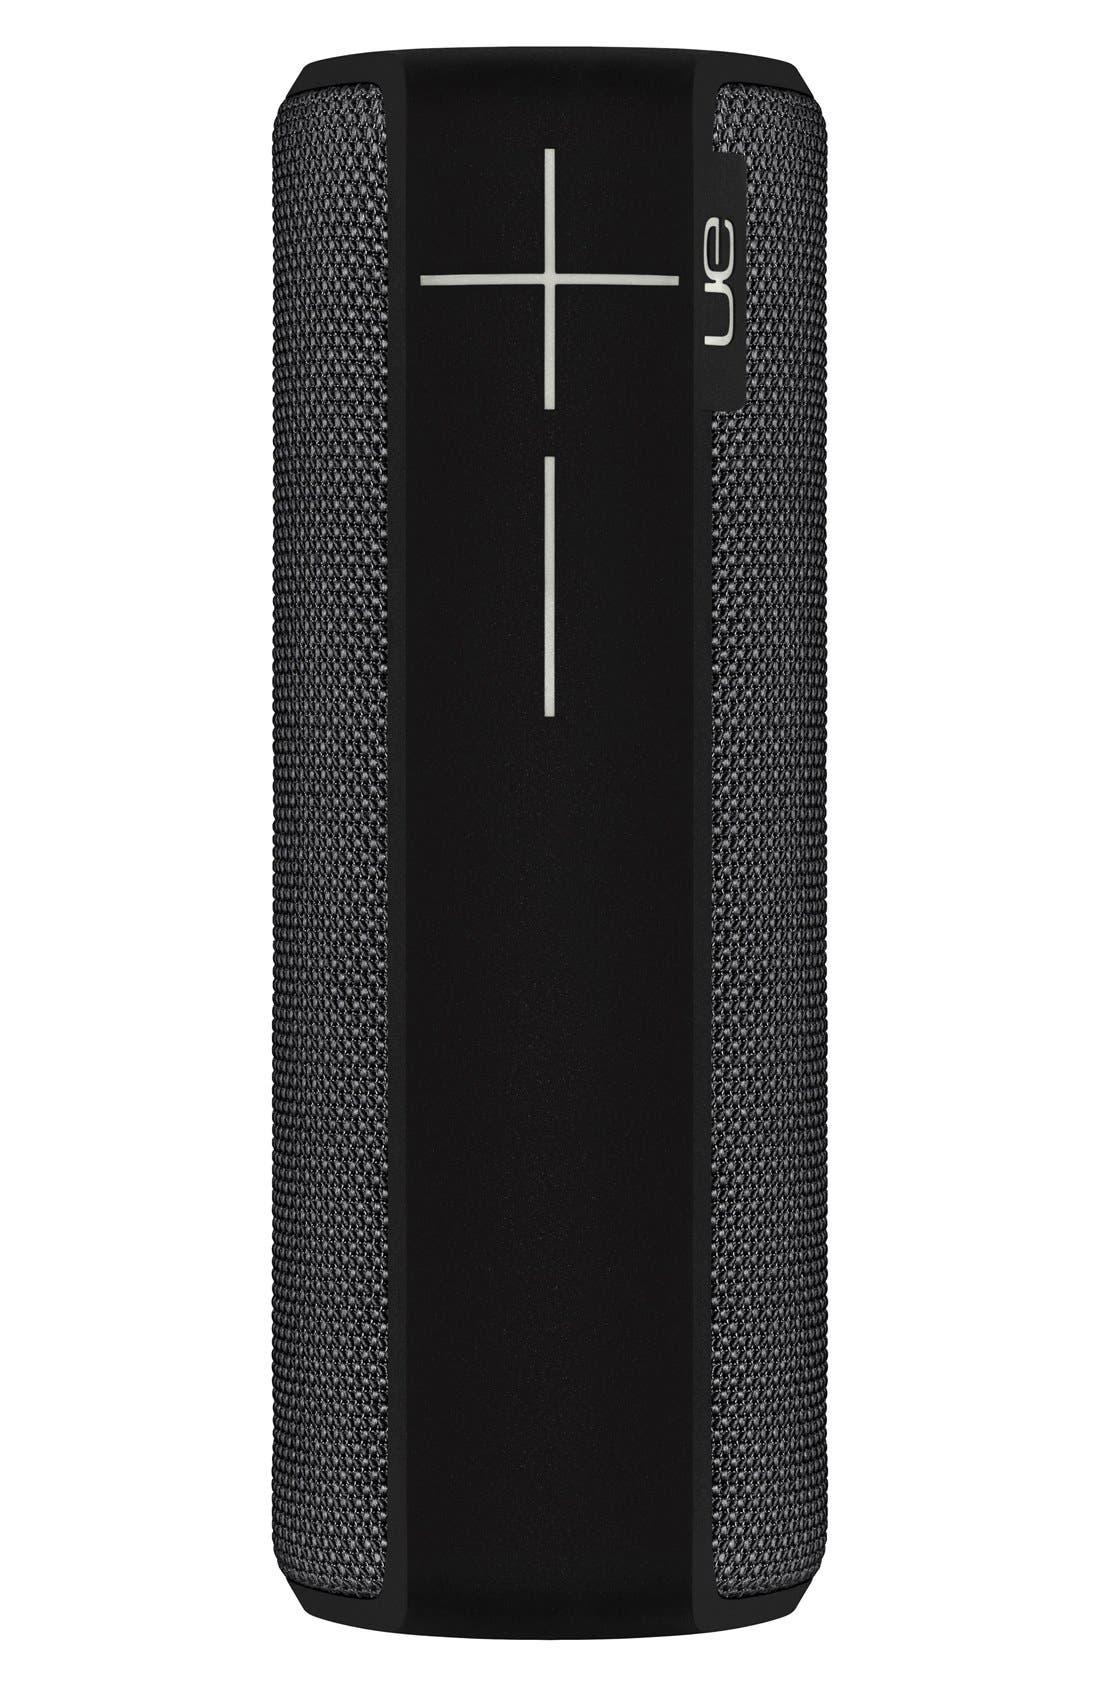 Main Image - UE Boom 2 Wireless Bluetooth® Speaker